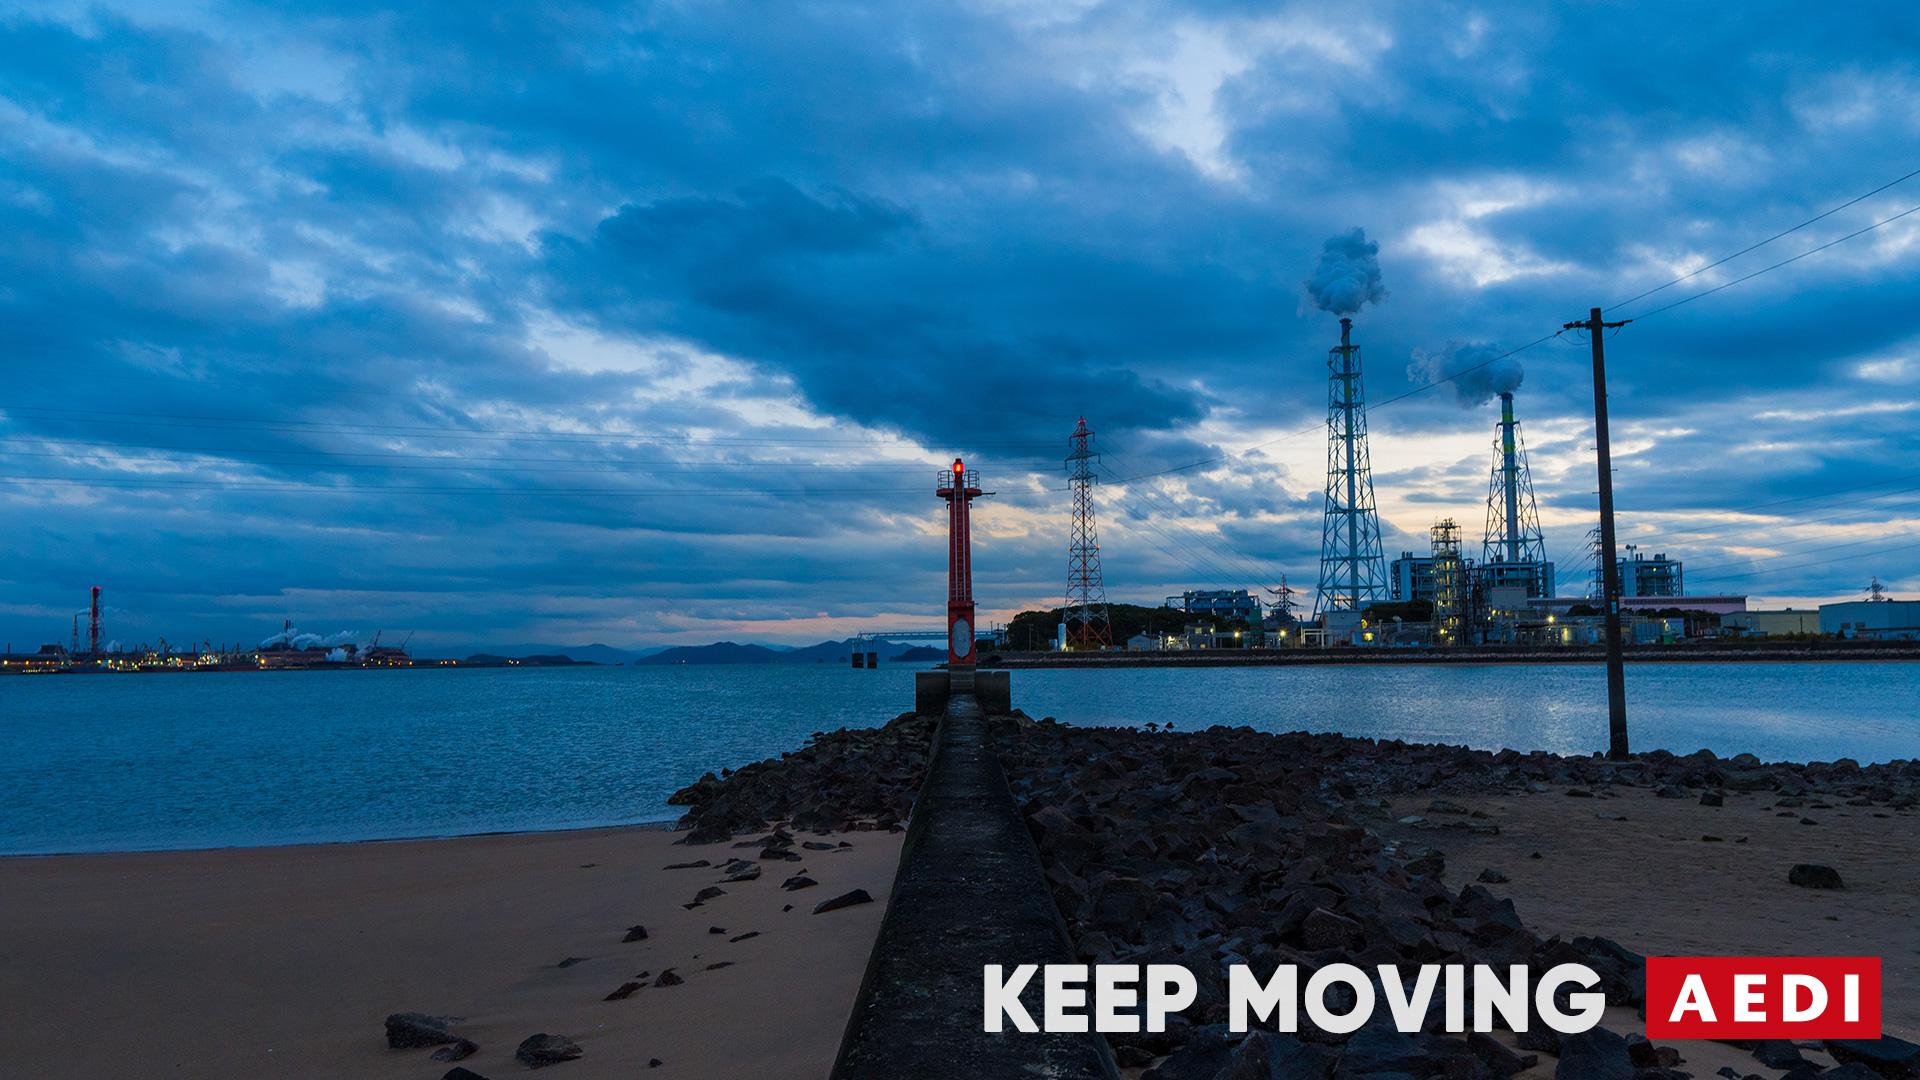 Keep Moving 岡山県倉敷市のWeb制作会社・デザイン会社 AEDIは12周年を迎えました